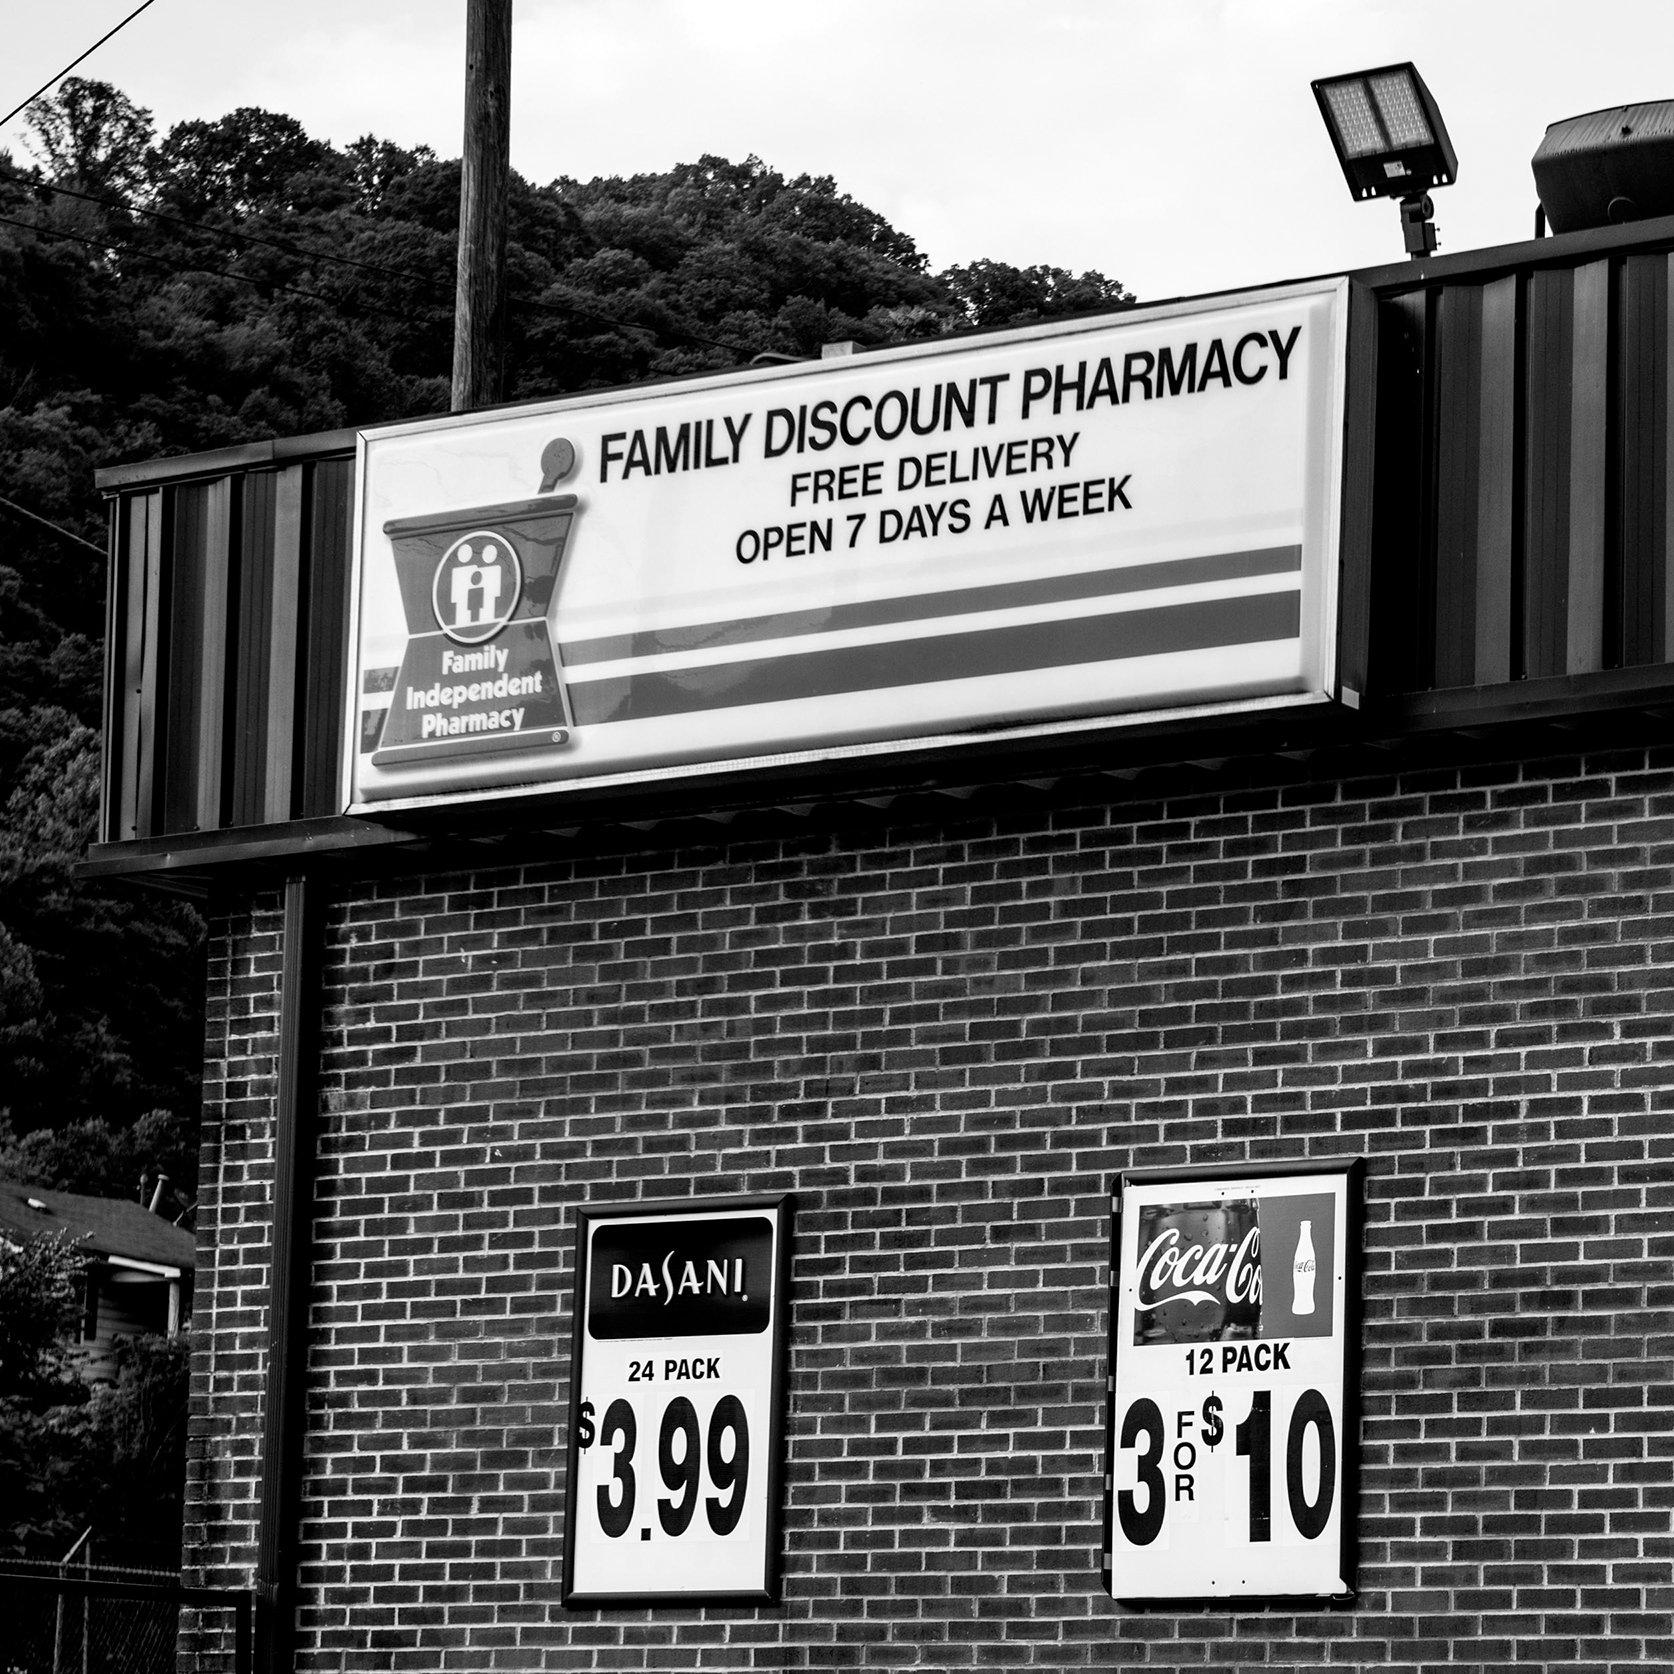 Family discount pharmacy